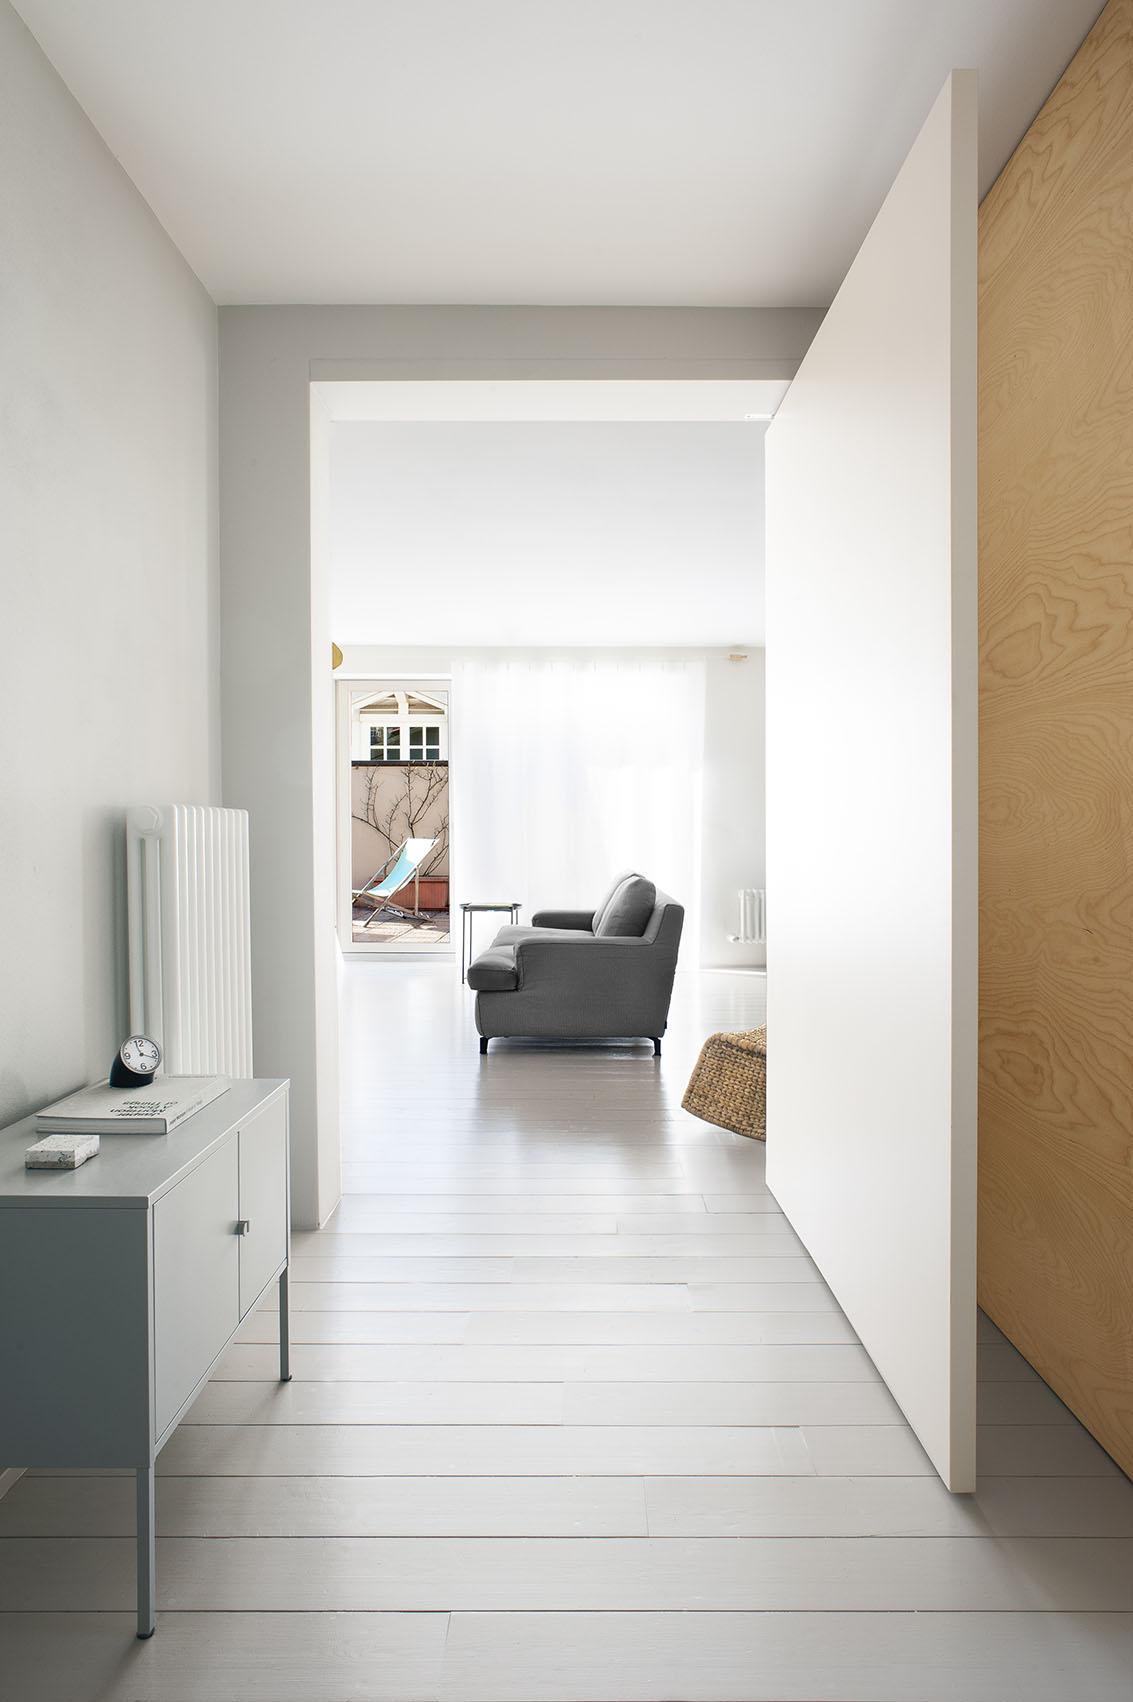 ingresso appartamento con porta a bilico officina magisafi - luca argenton